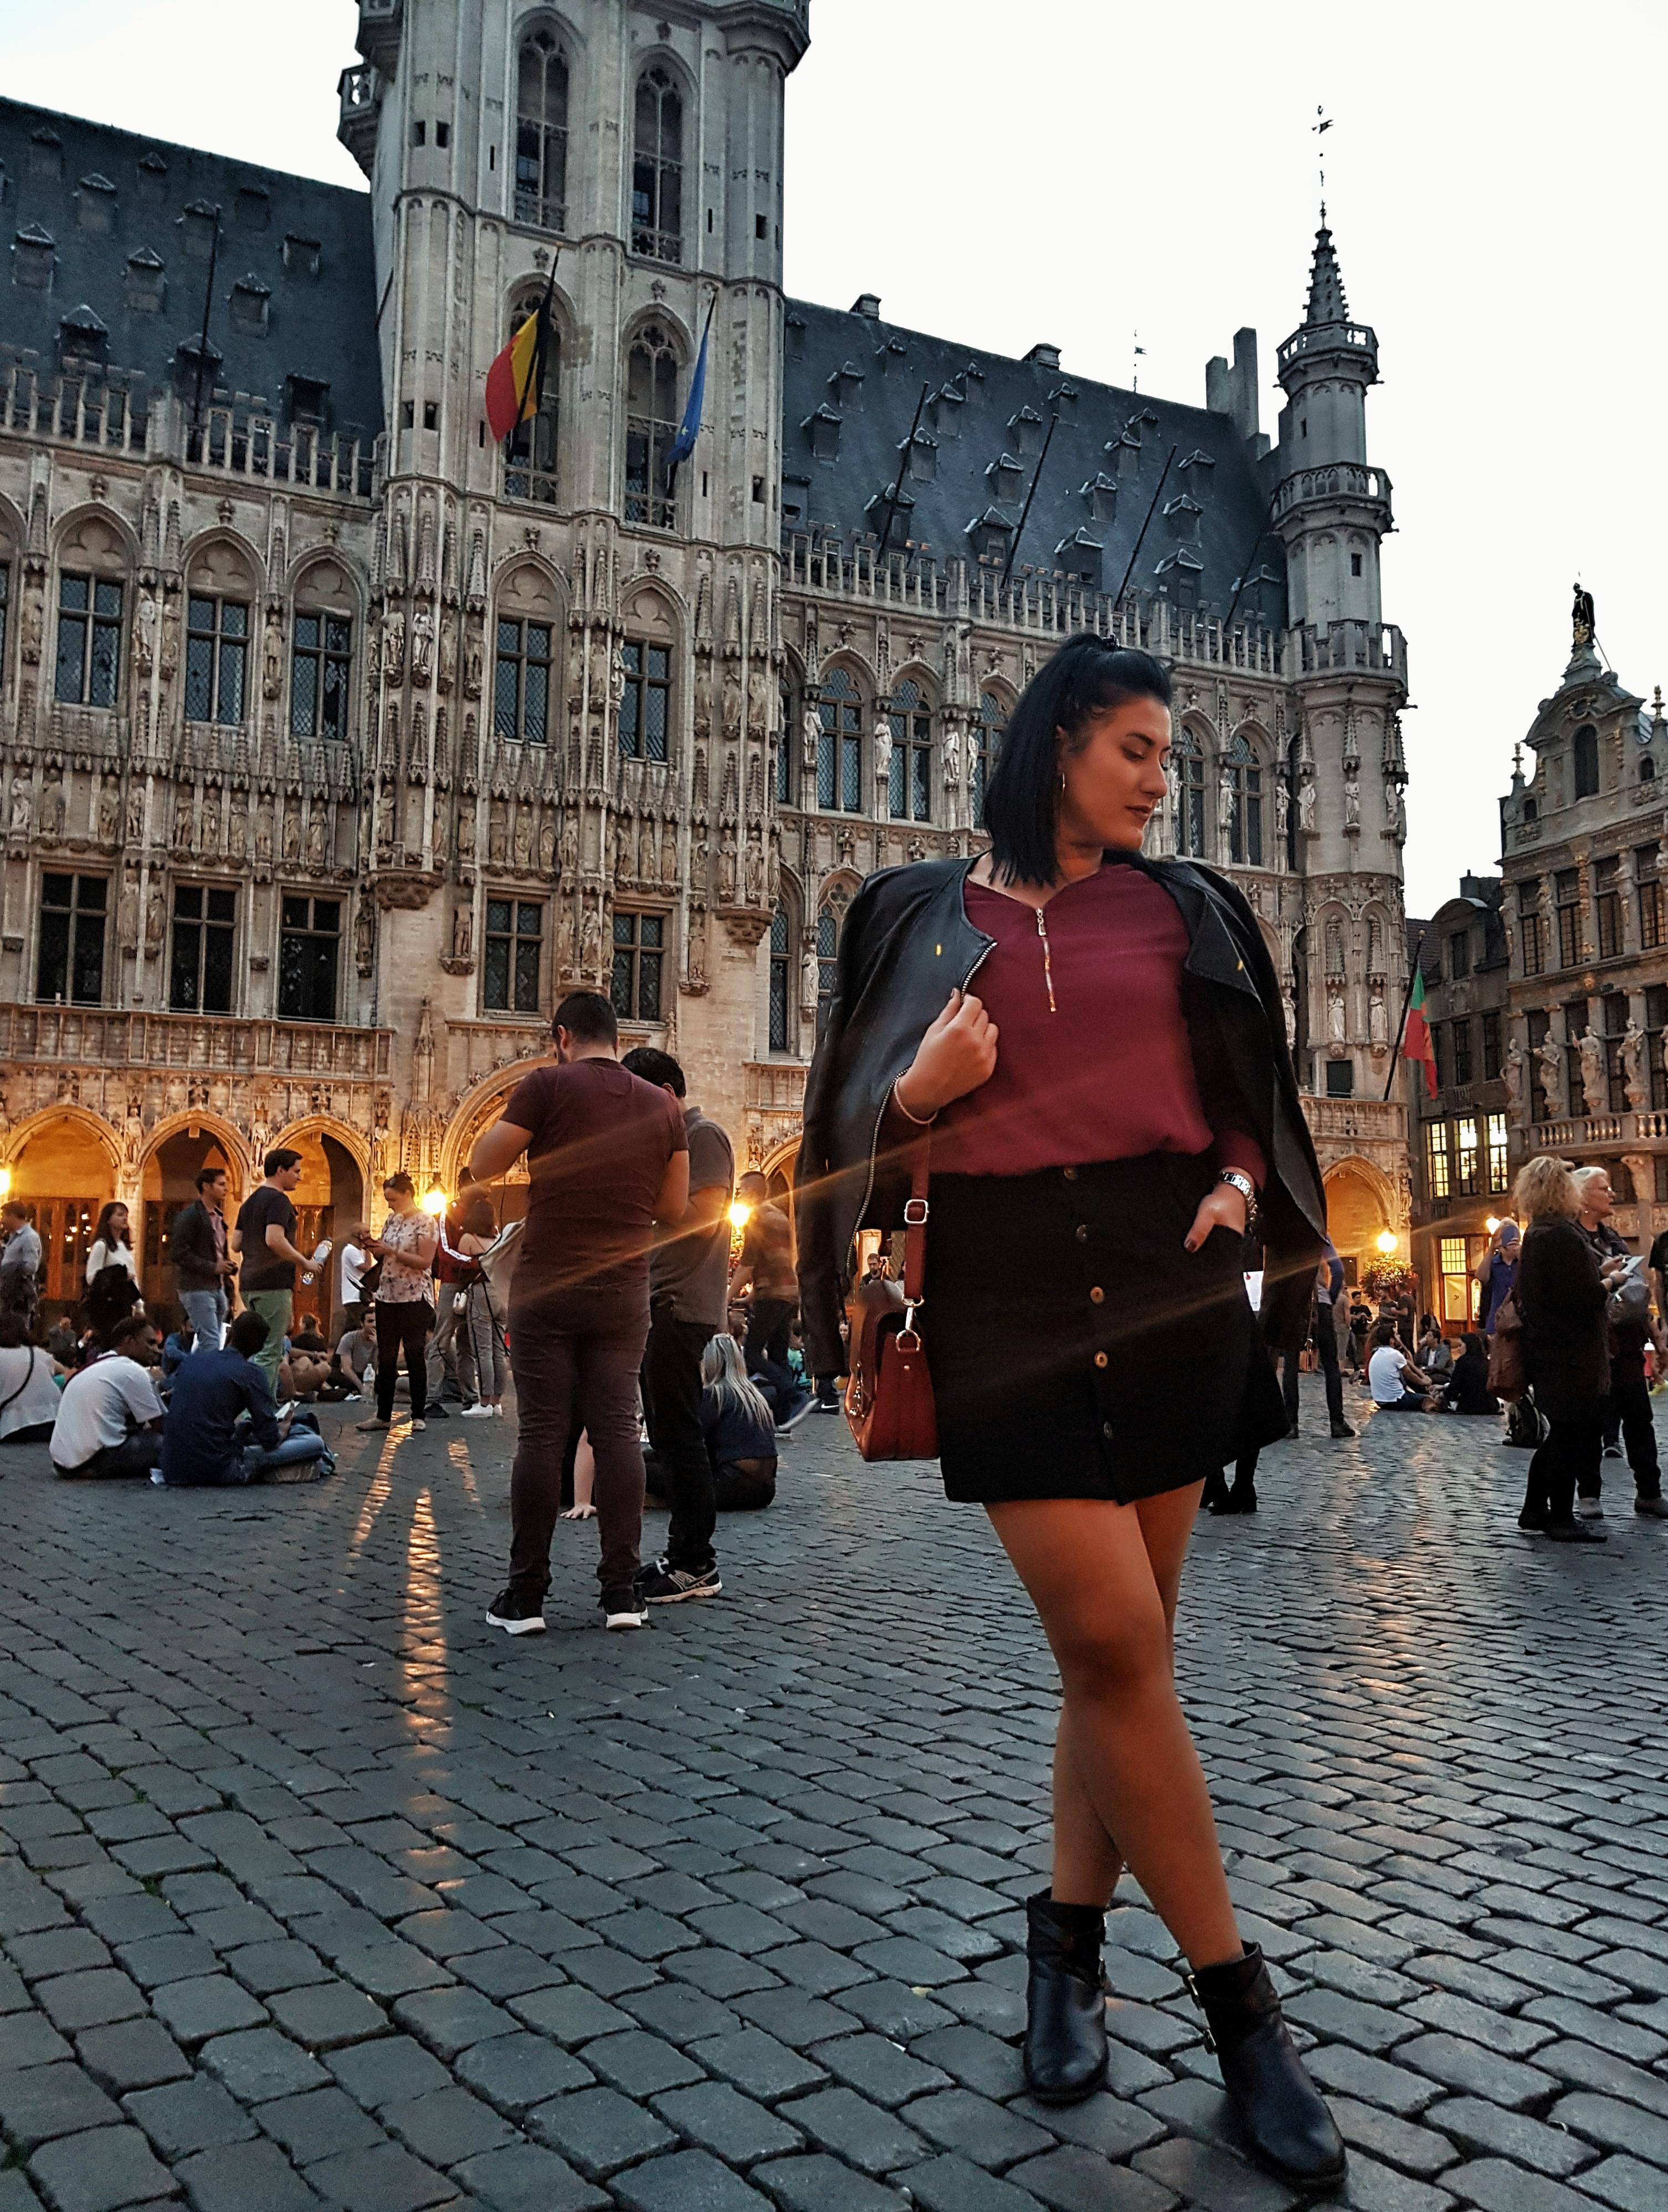 Burgundy_&_black_combo_Yoinsreview_Topreview_belgium_brussels